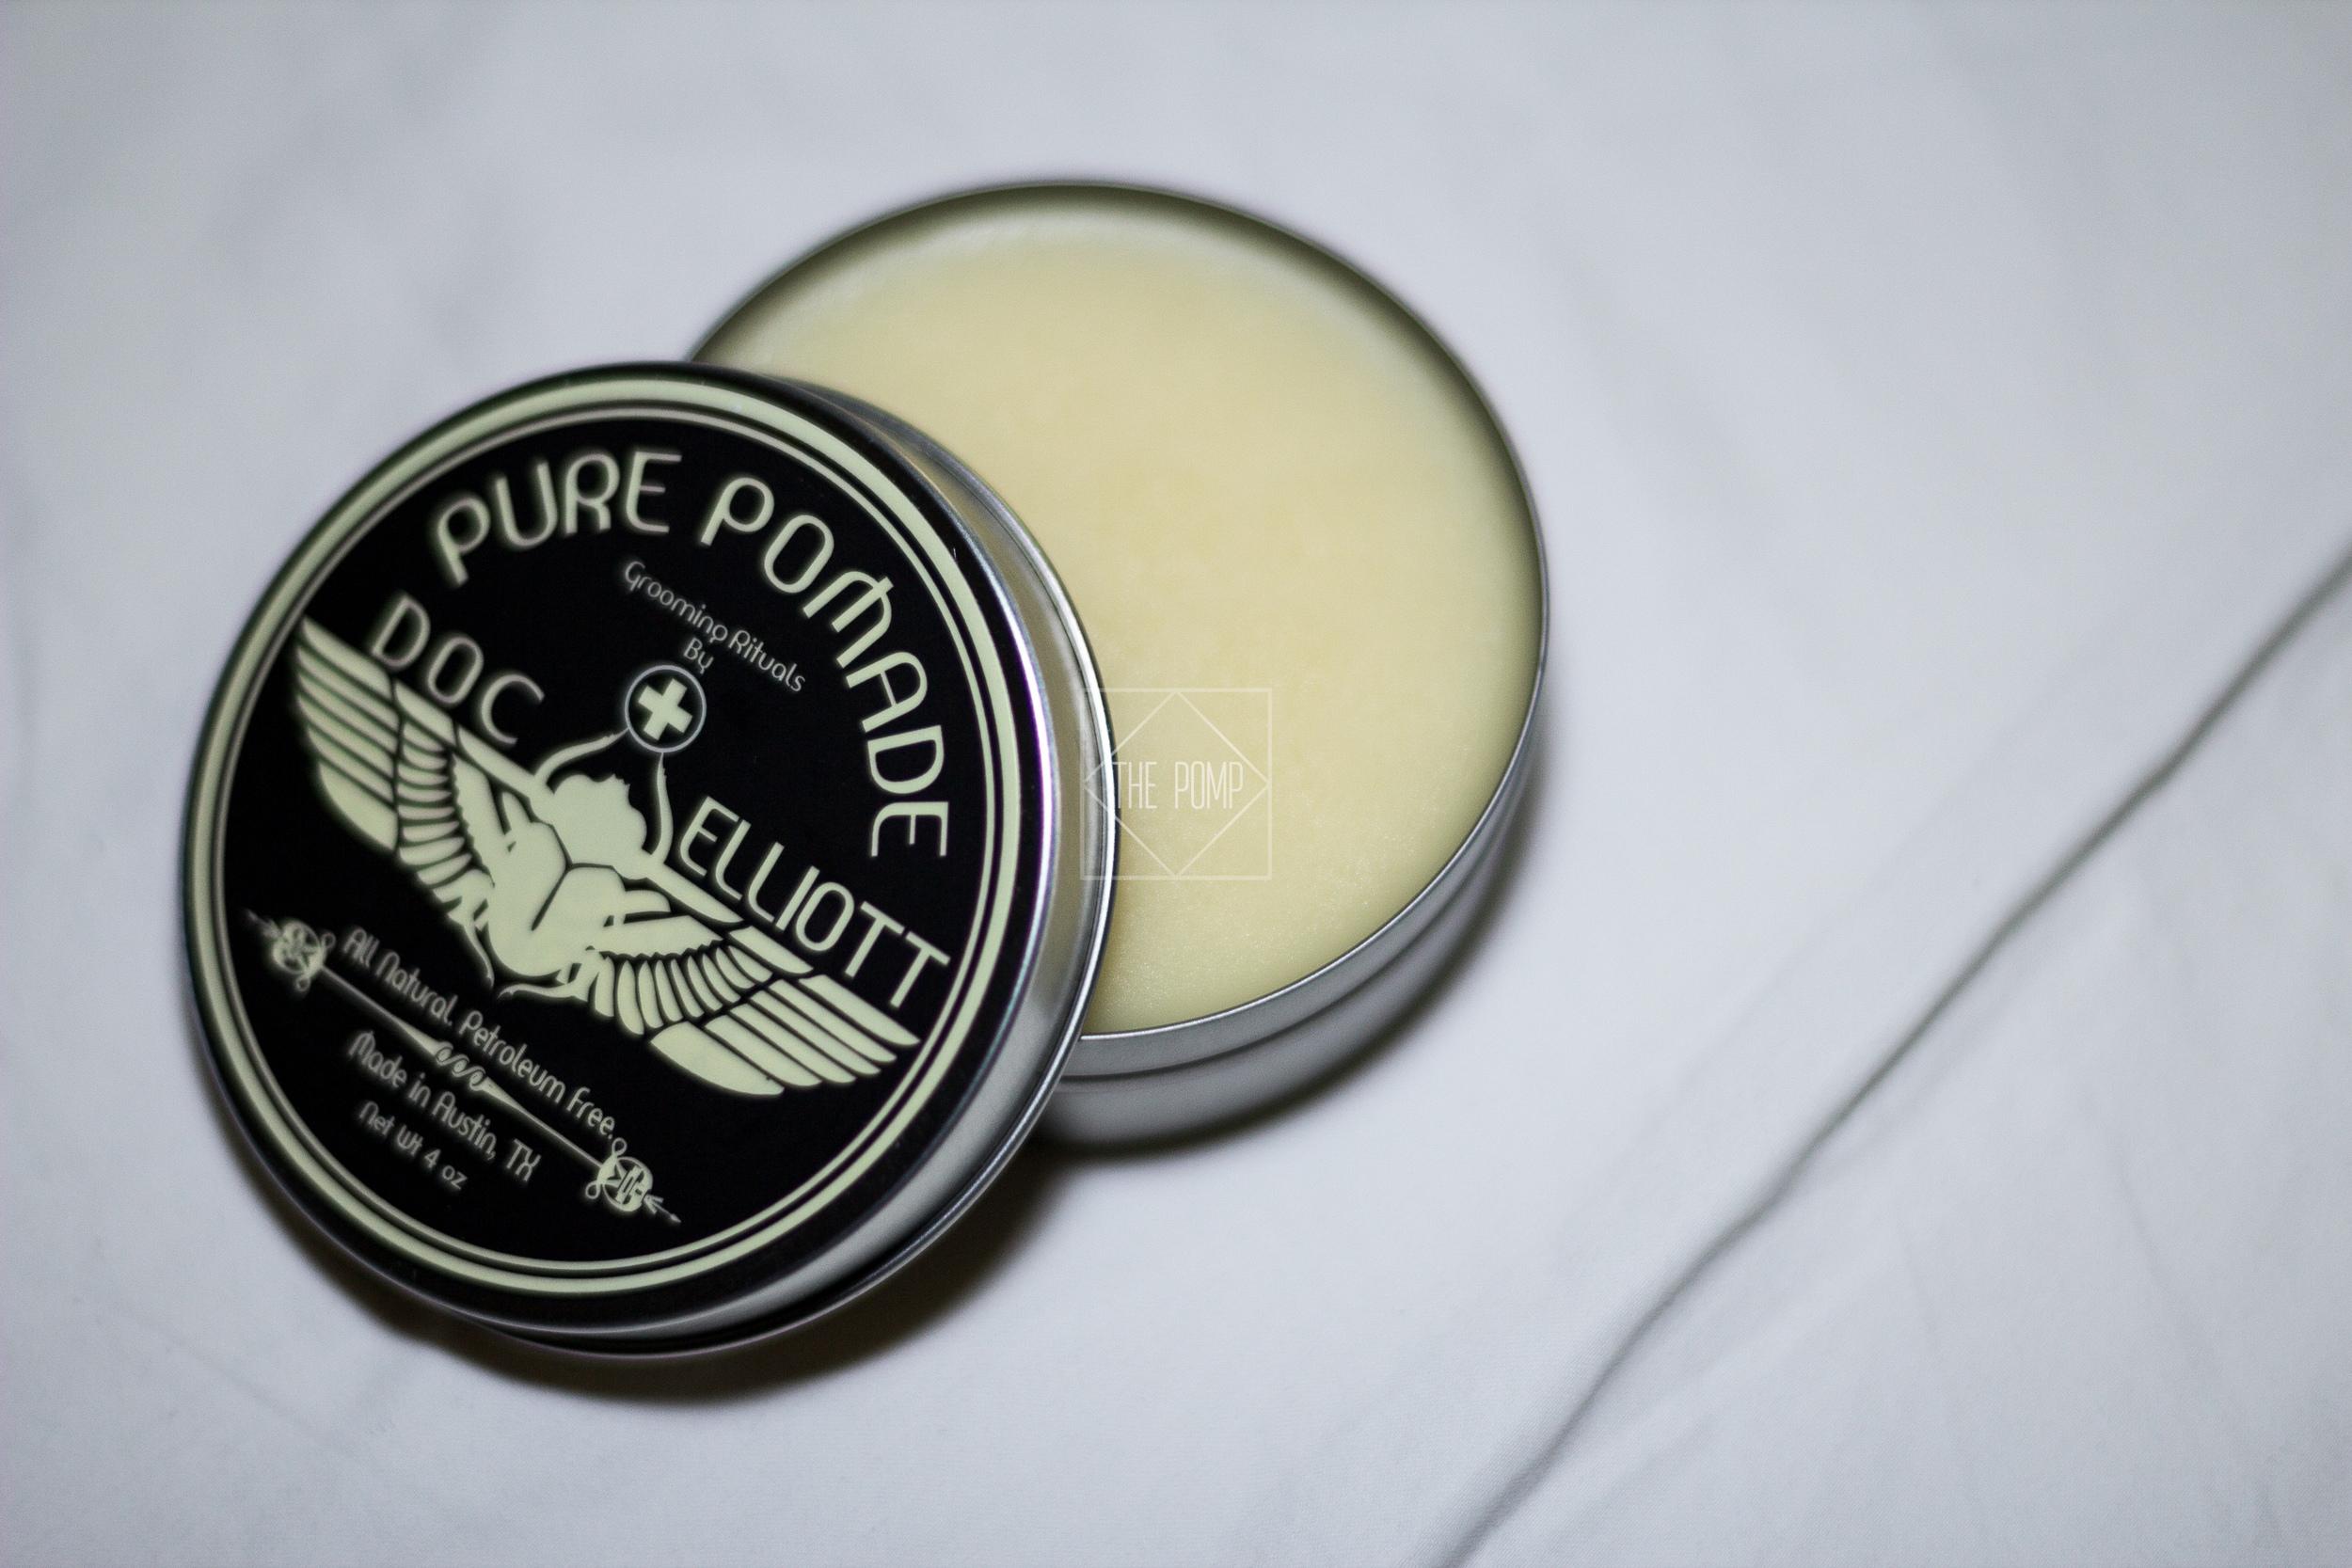 Doc Elliott Pure Pomade texture